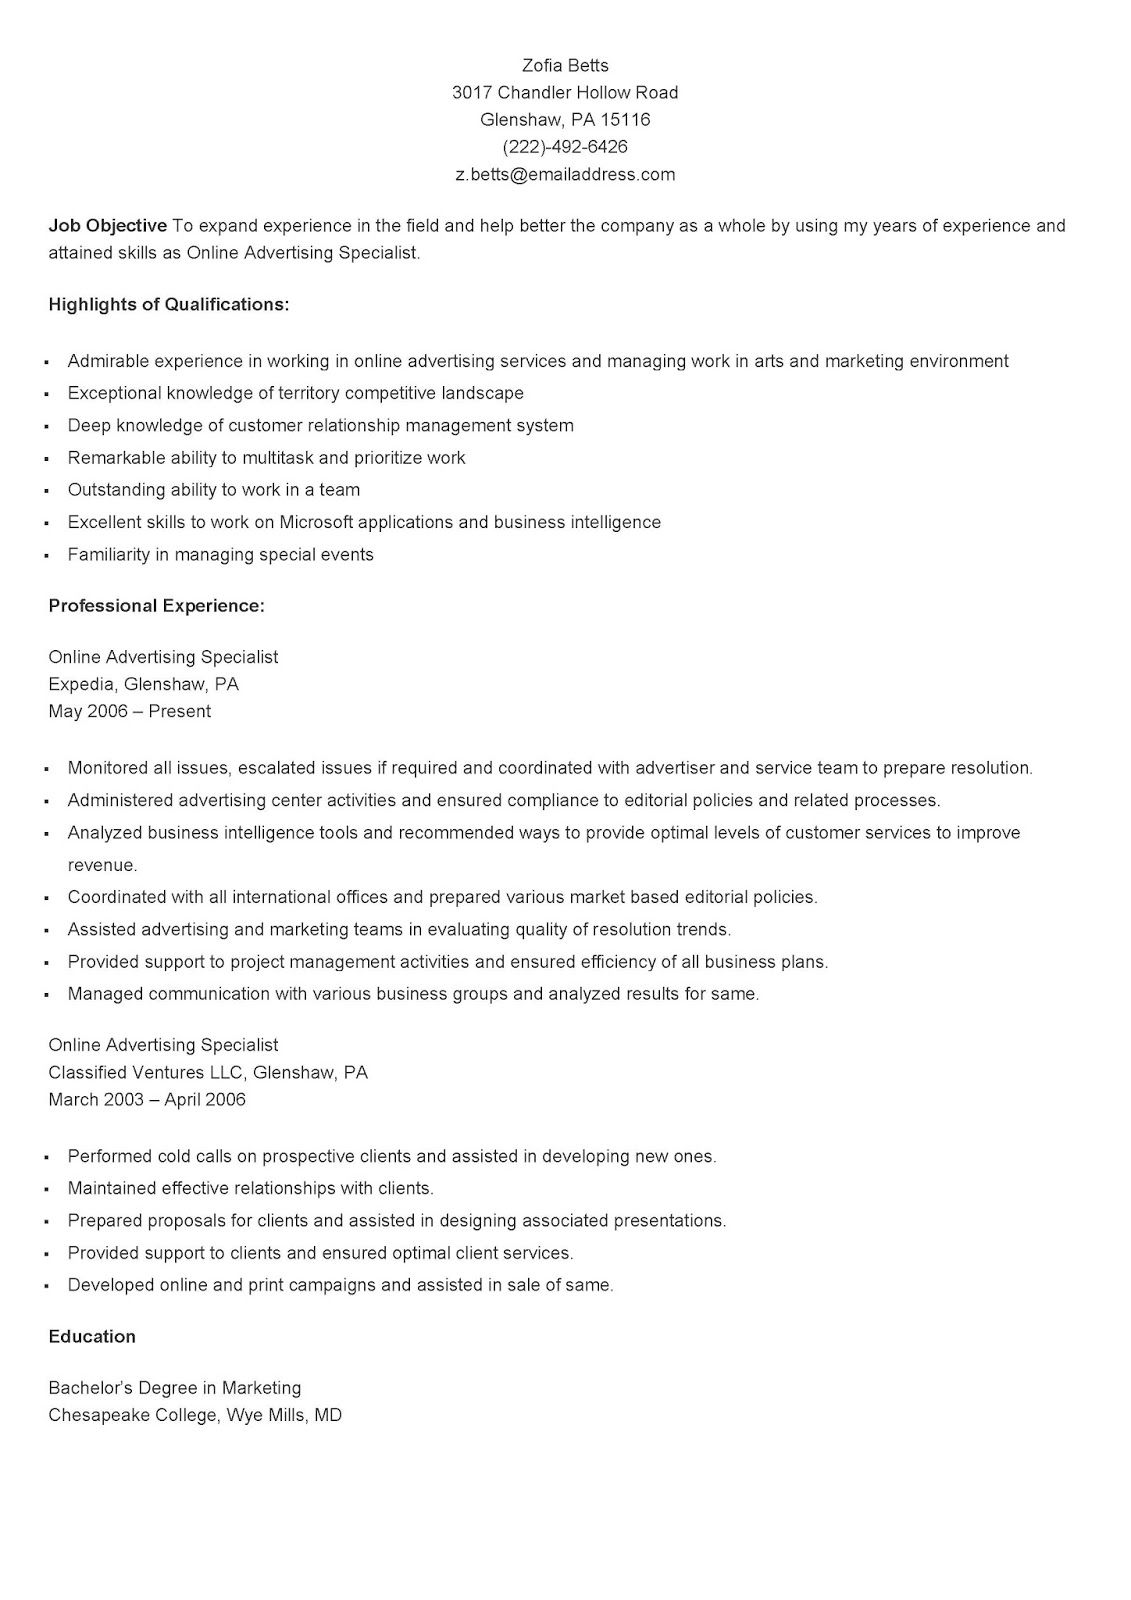 Sample Online Advertising Specialist Resume Marketing Resume Online Advertising Resume Advice